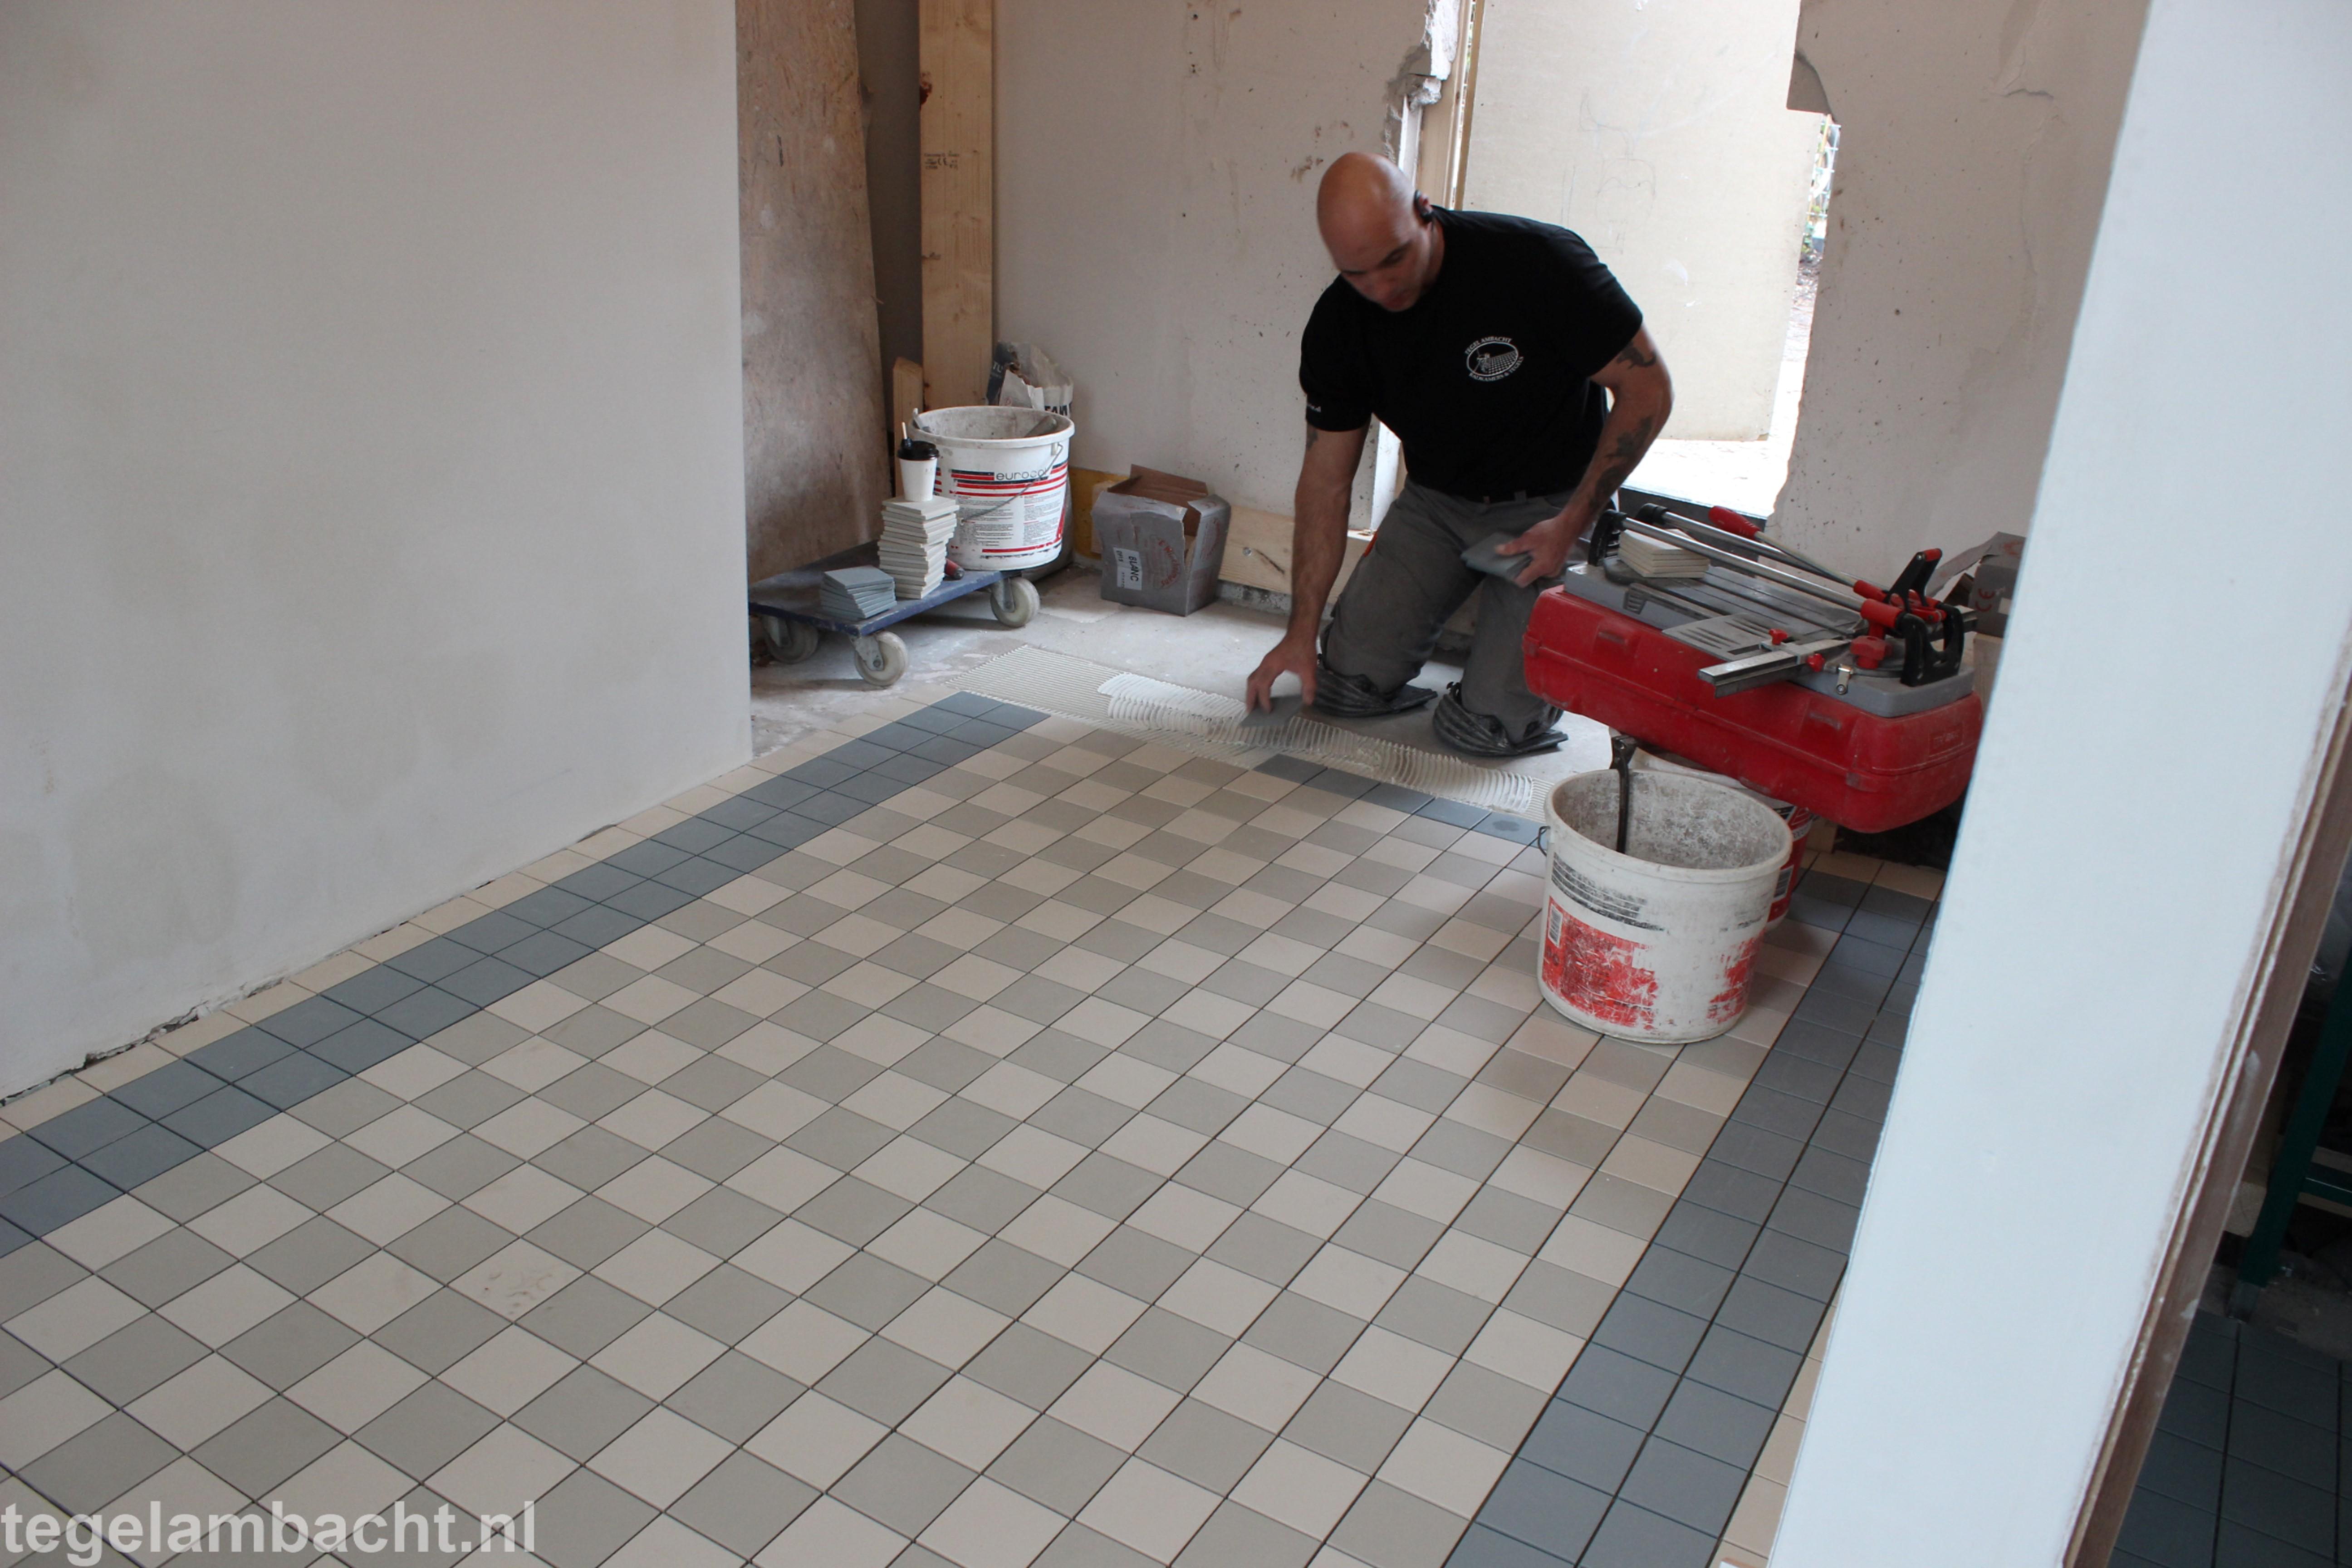 Tegel ambacht badkamers tegels in harderwijk almere